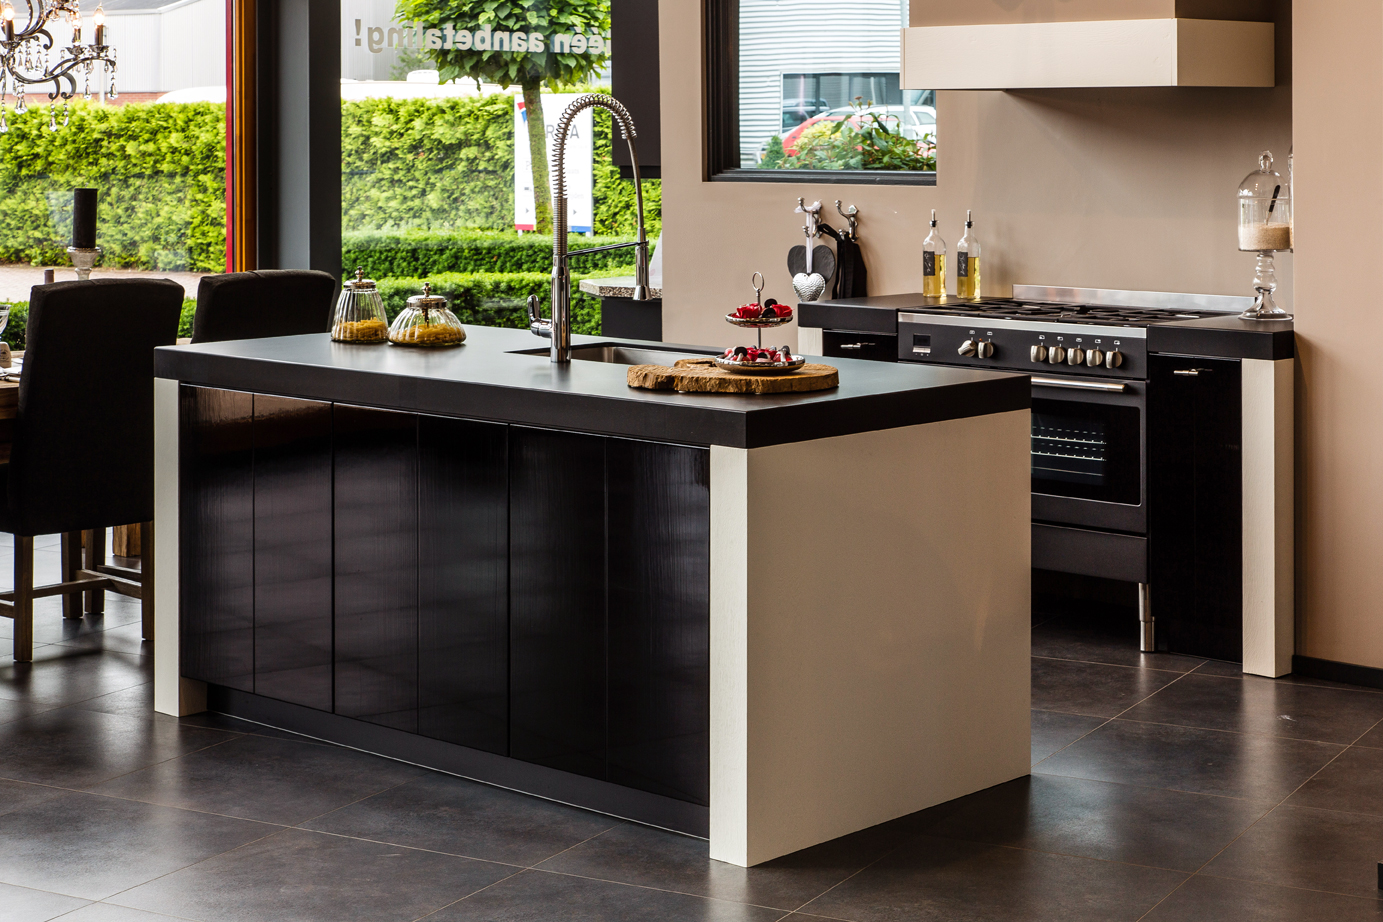 Landelijke Keuken Falcon : Keuken met keukeneiland DB Keukens